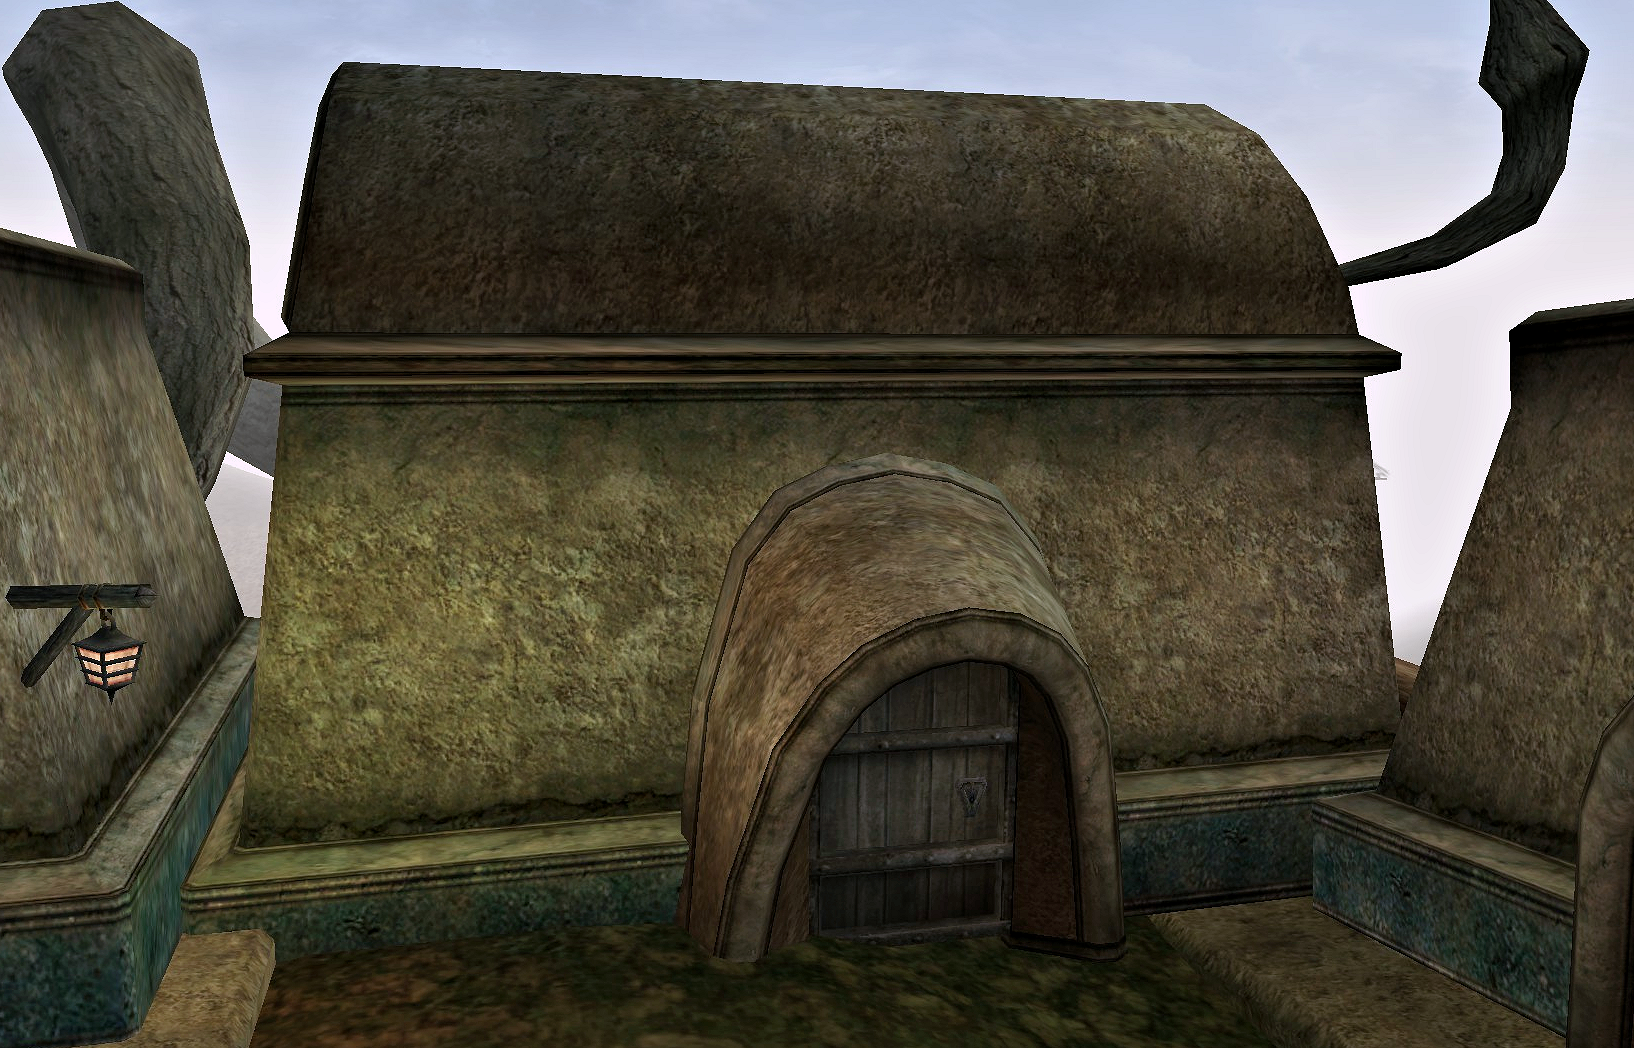 Ienasa Radas's Farmhouse